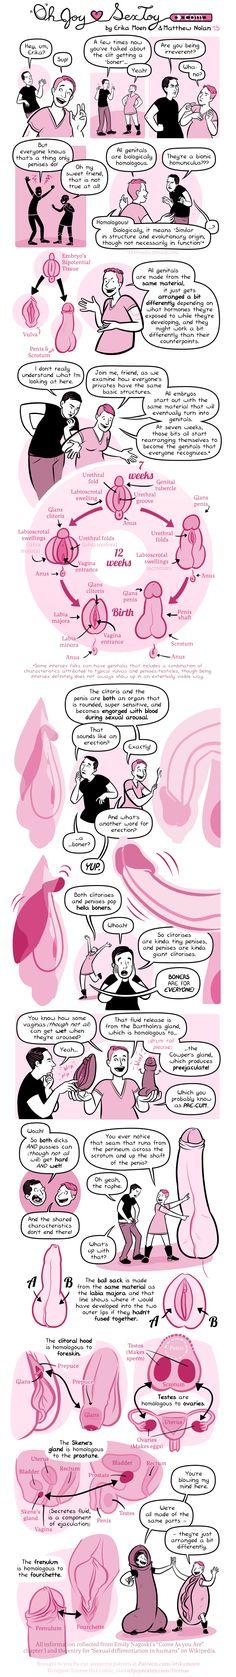 Sex angelina jolie west comics Girls